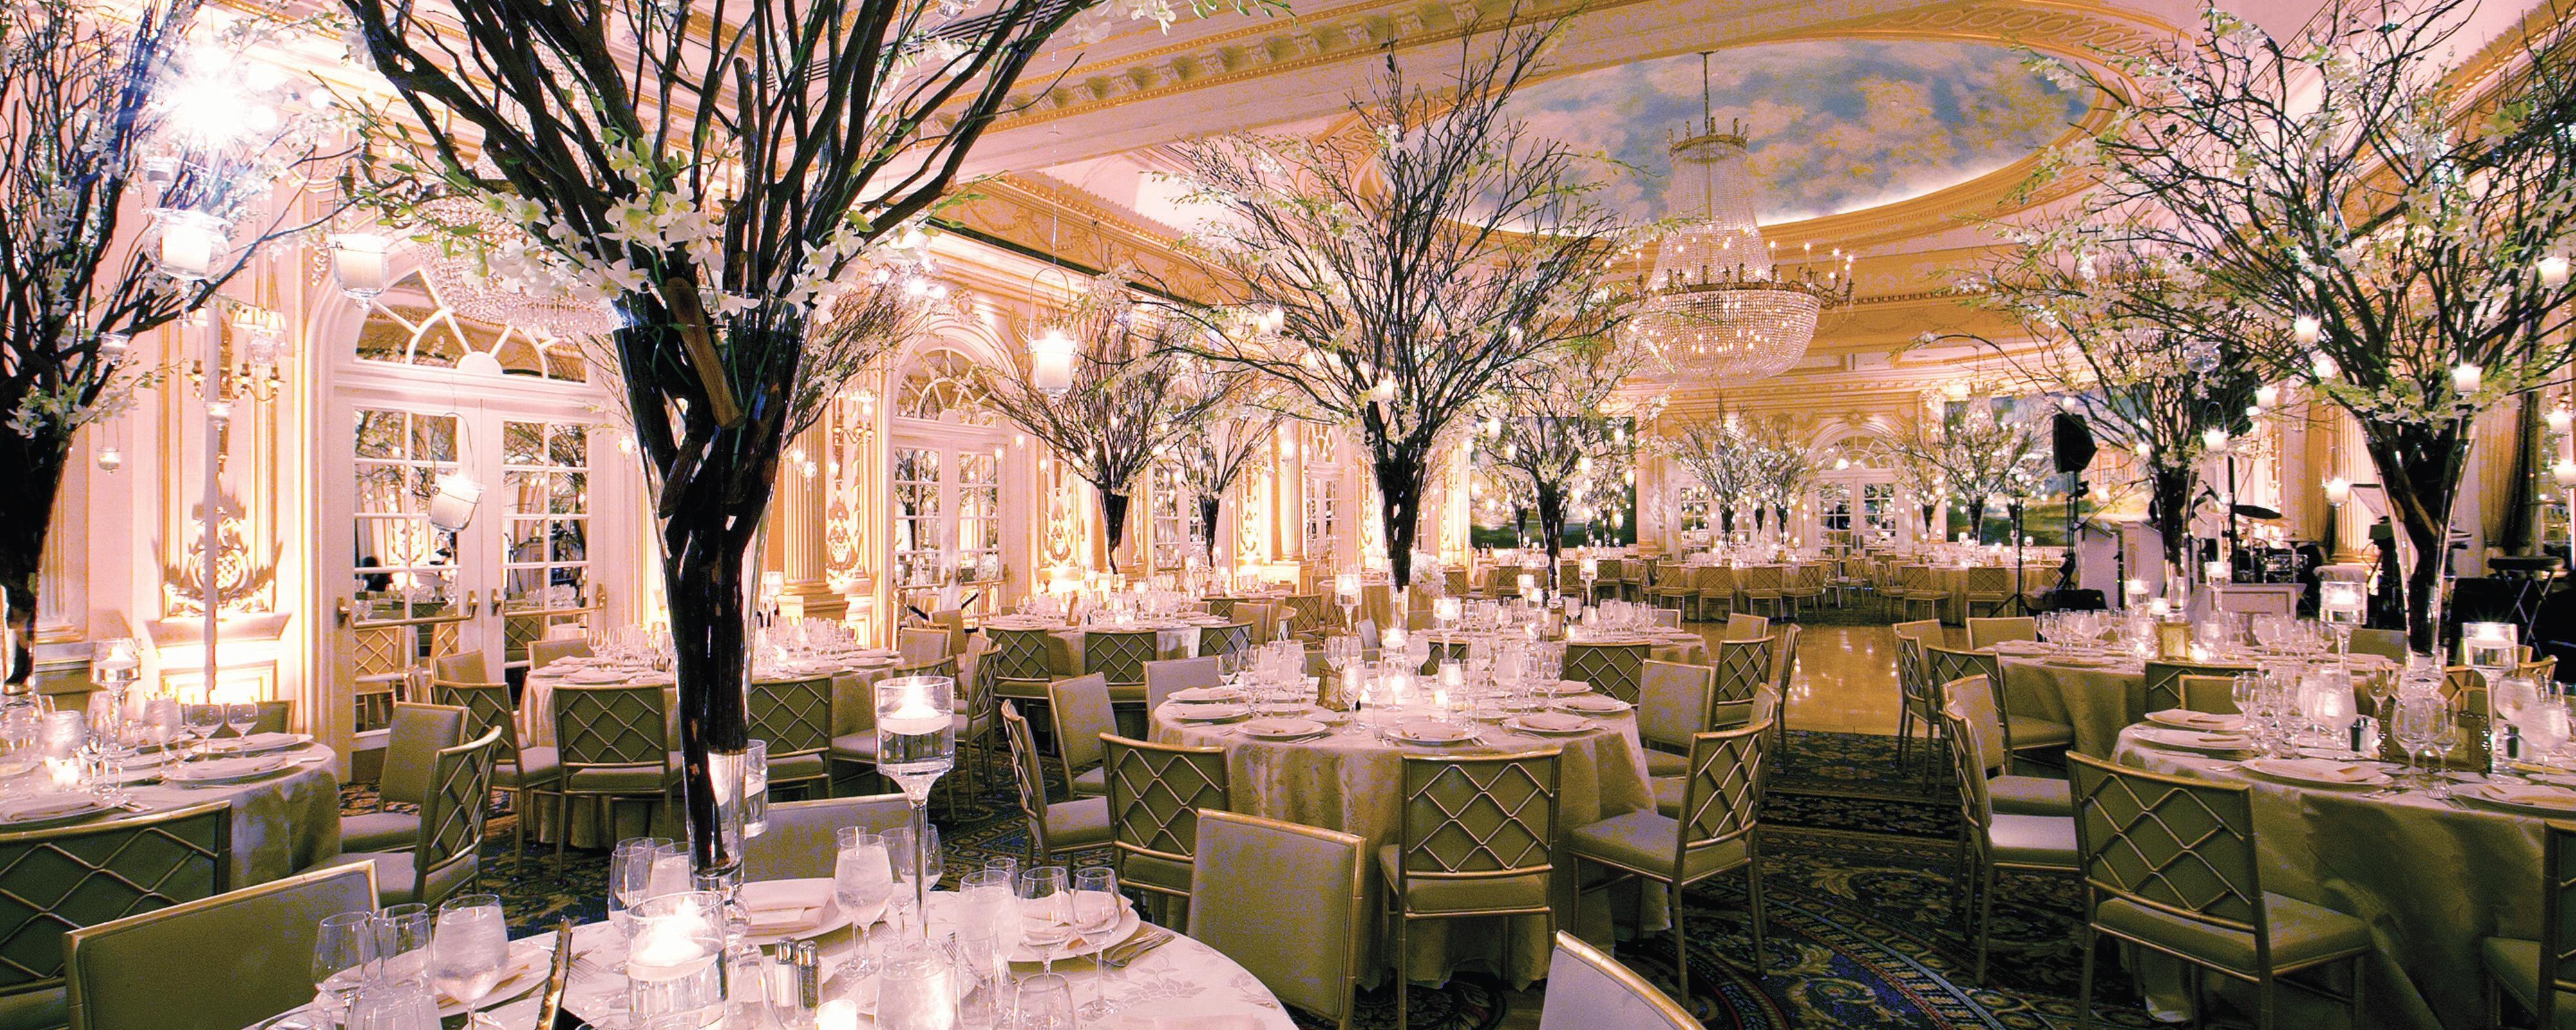 Central Park Wedding Reception Locations Jw Marriott Es House New York